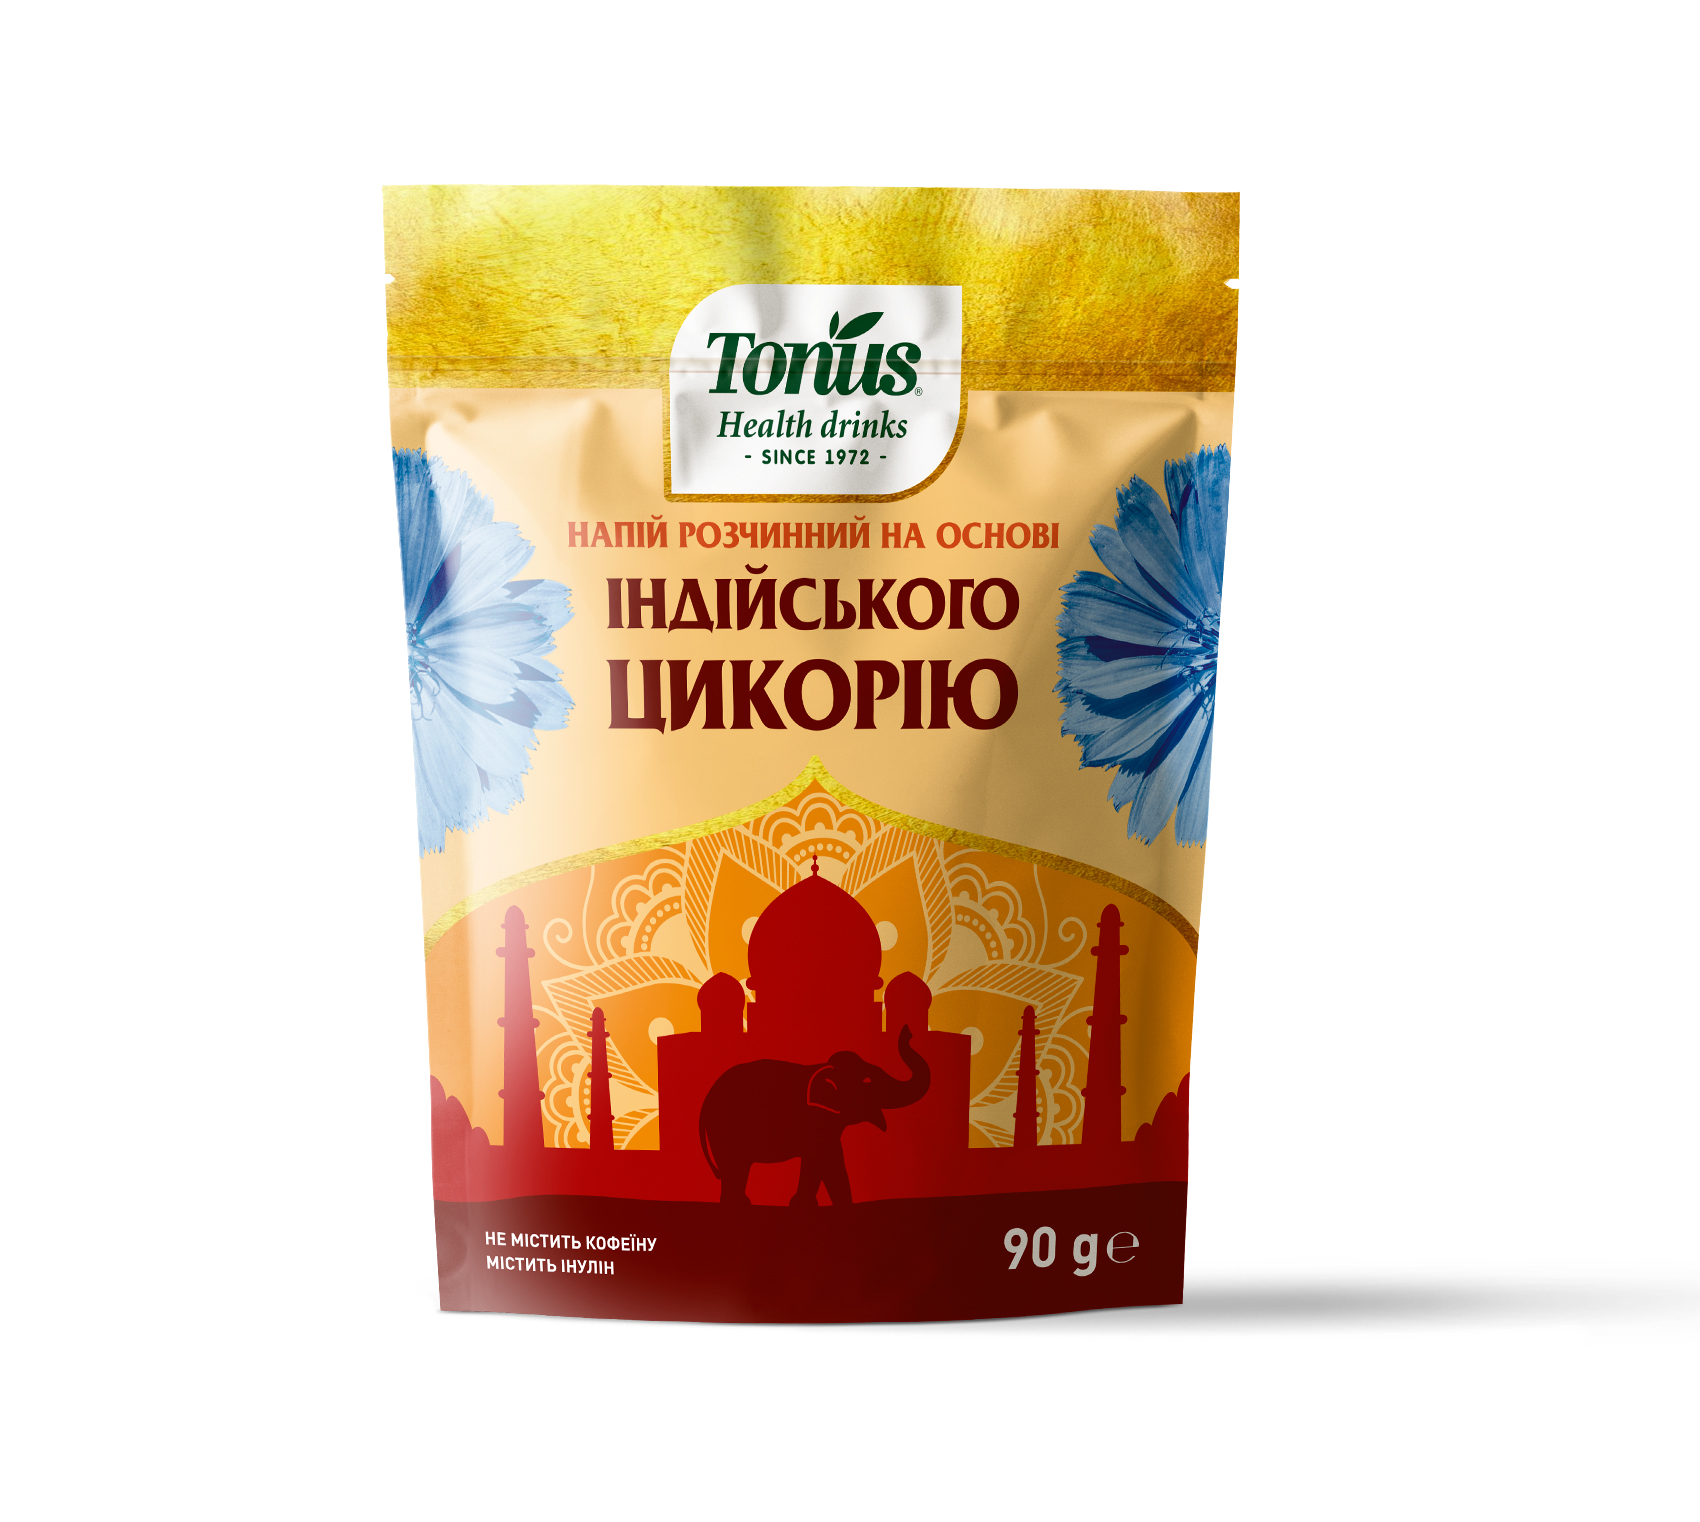 индийский цикорий